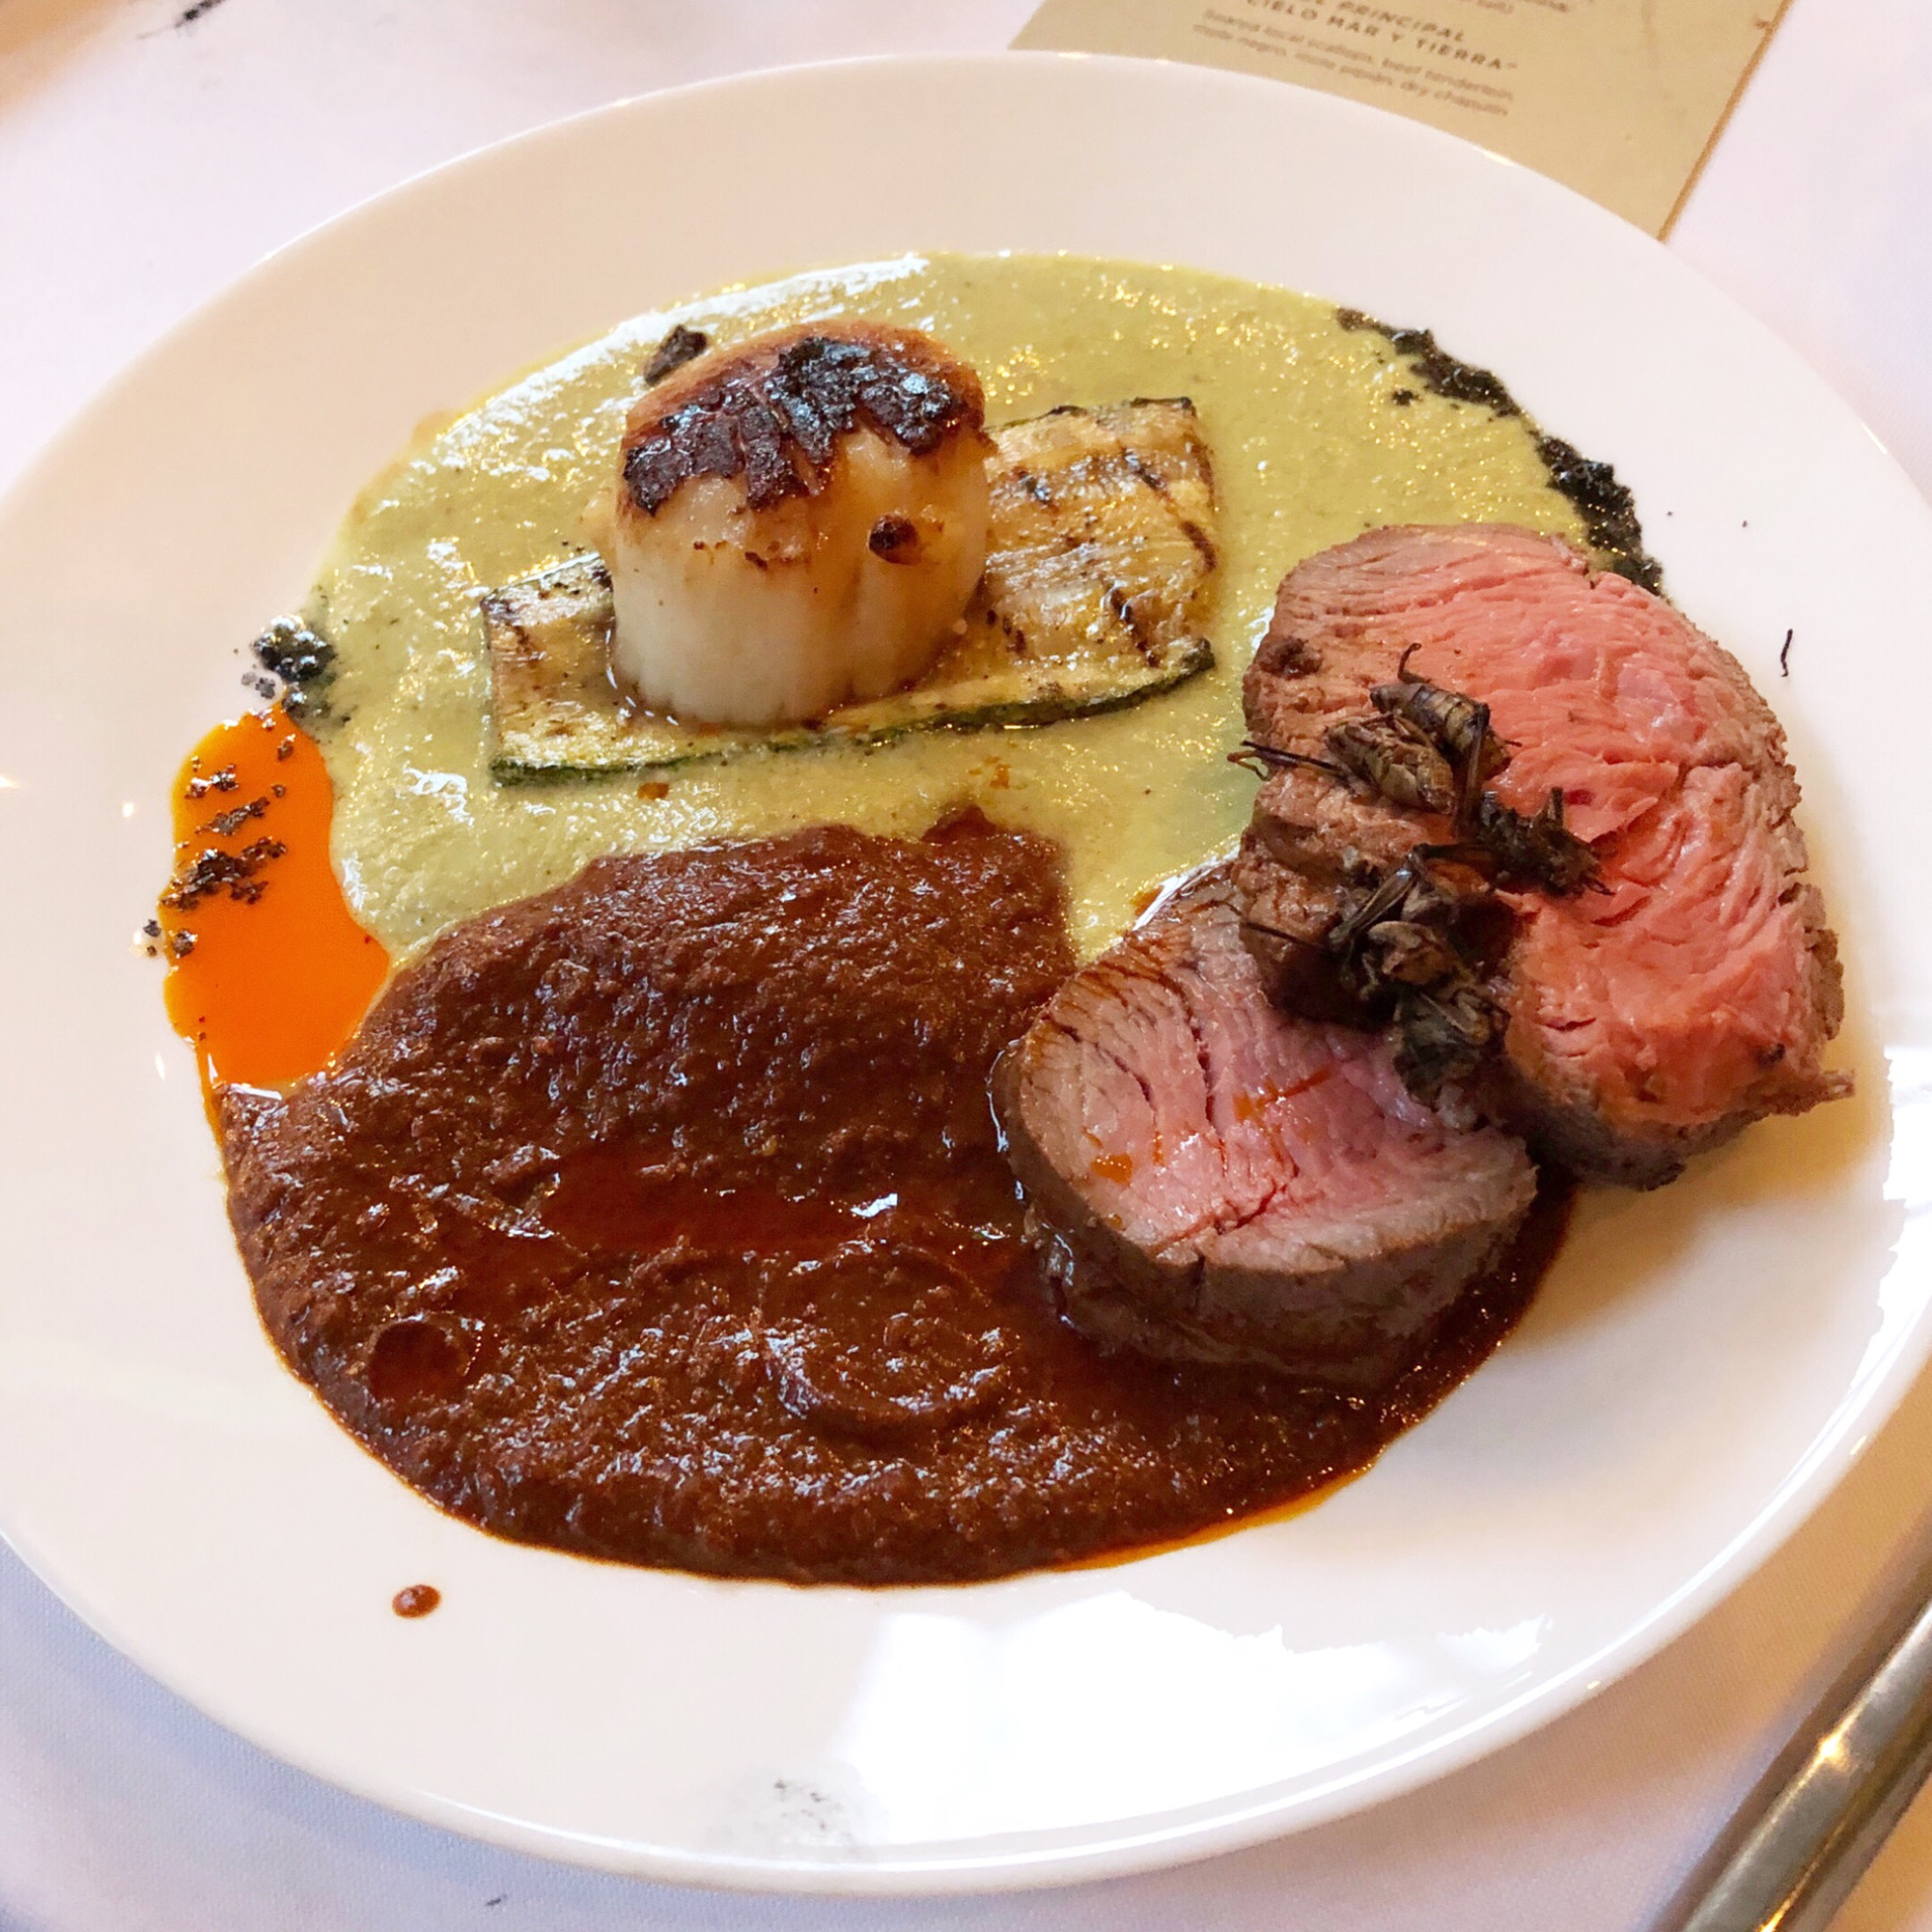 Seared scallops, mole, chapulines, and beef tenderloin by Chef Carlos Raba